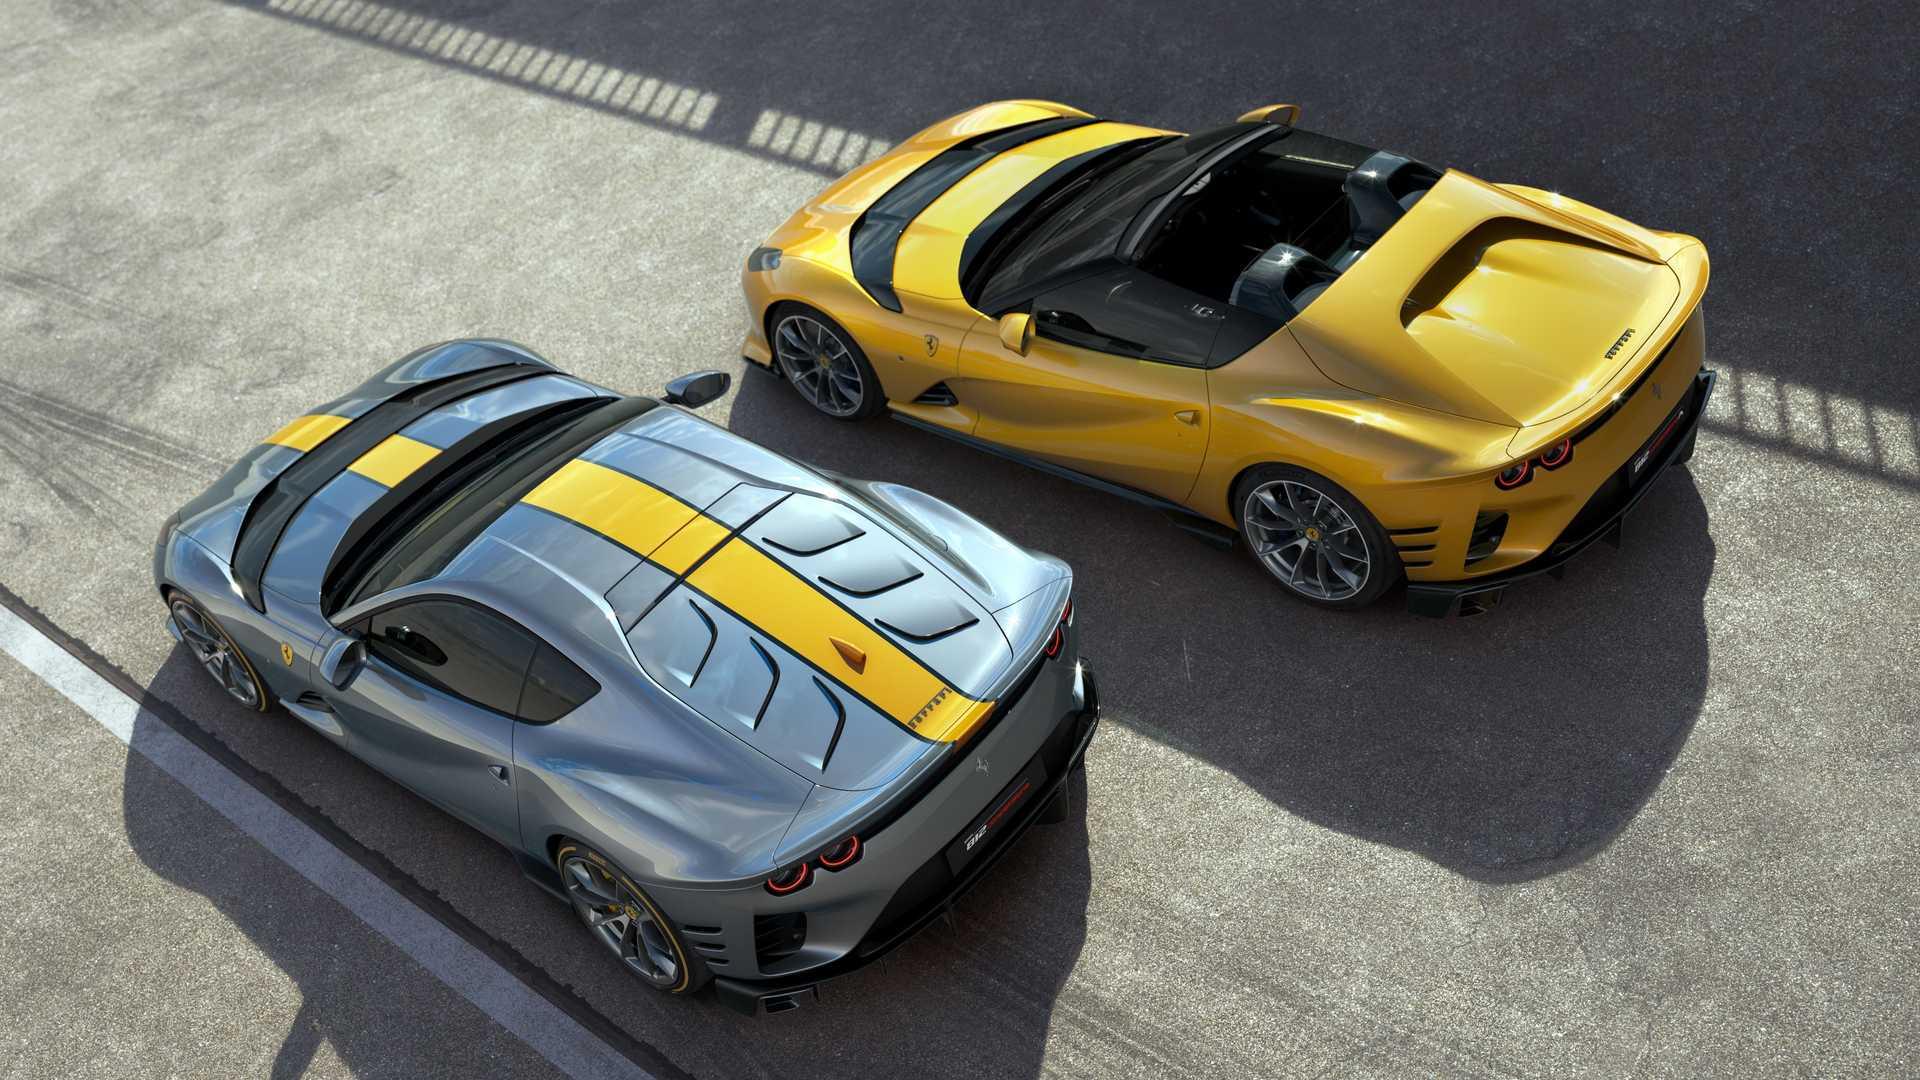 Ferrari 812 Competizione, 2021 Ford Shelby GT, 2022 BMW X3: Car News Headlines